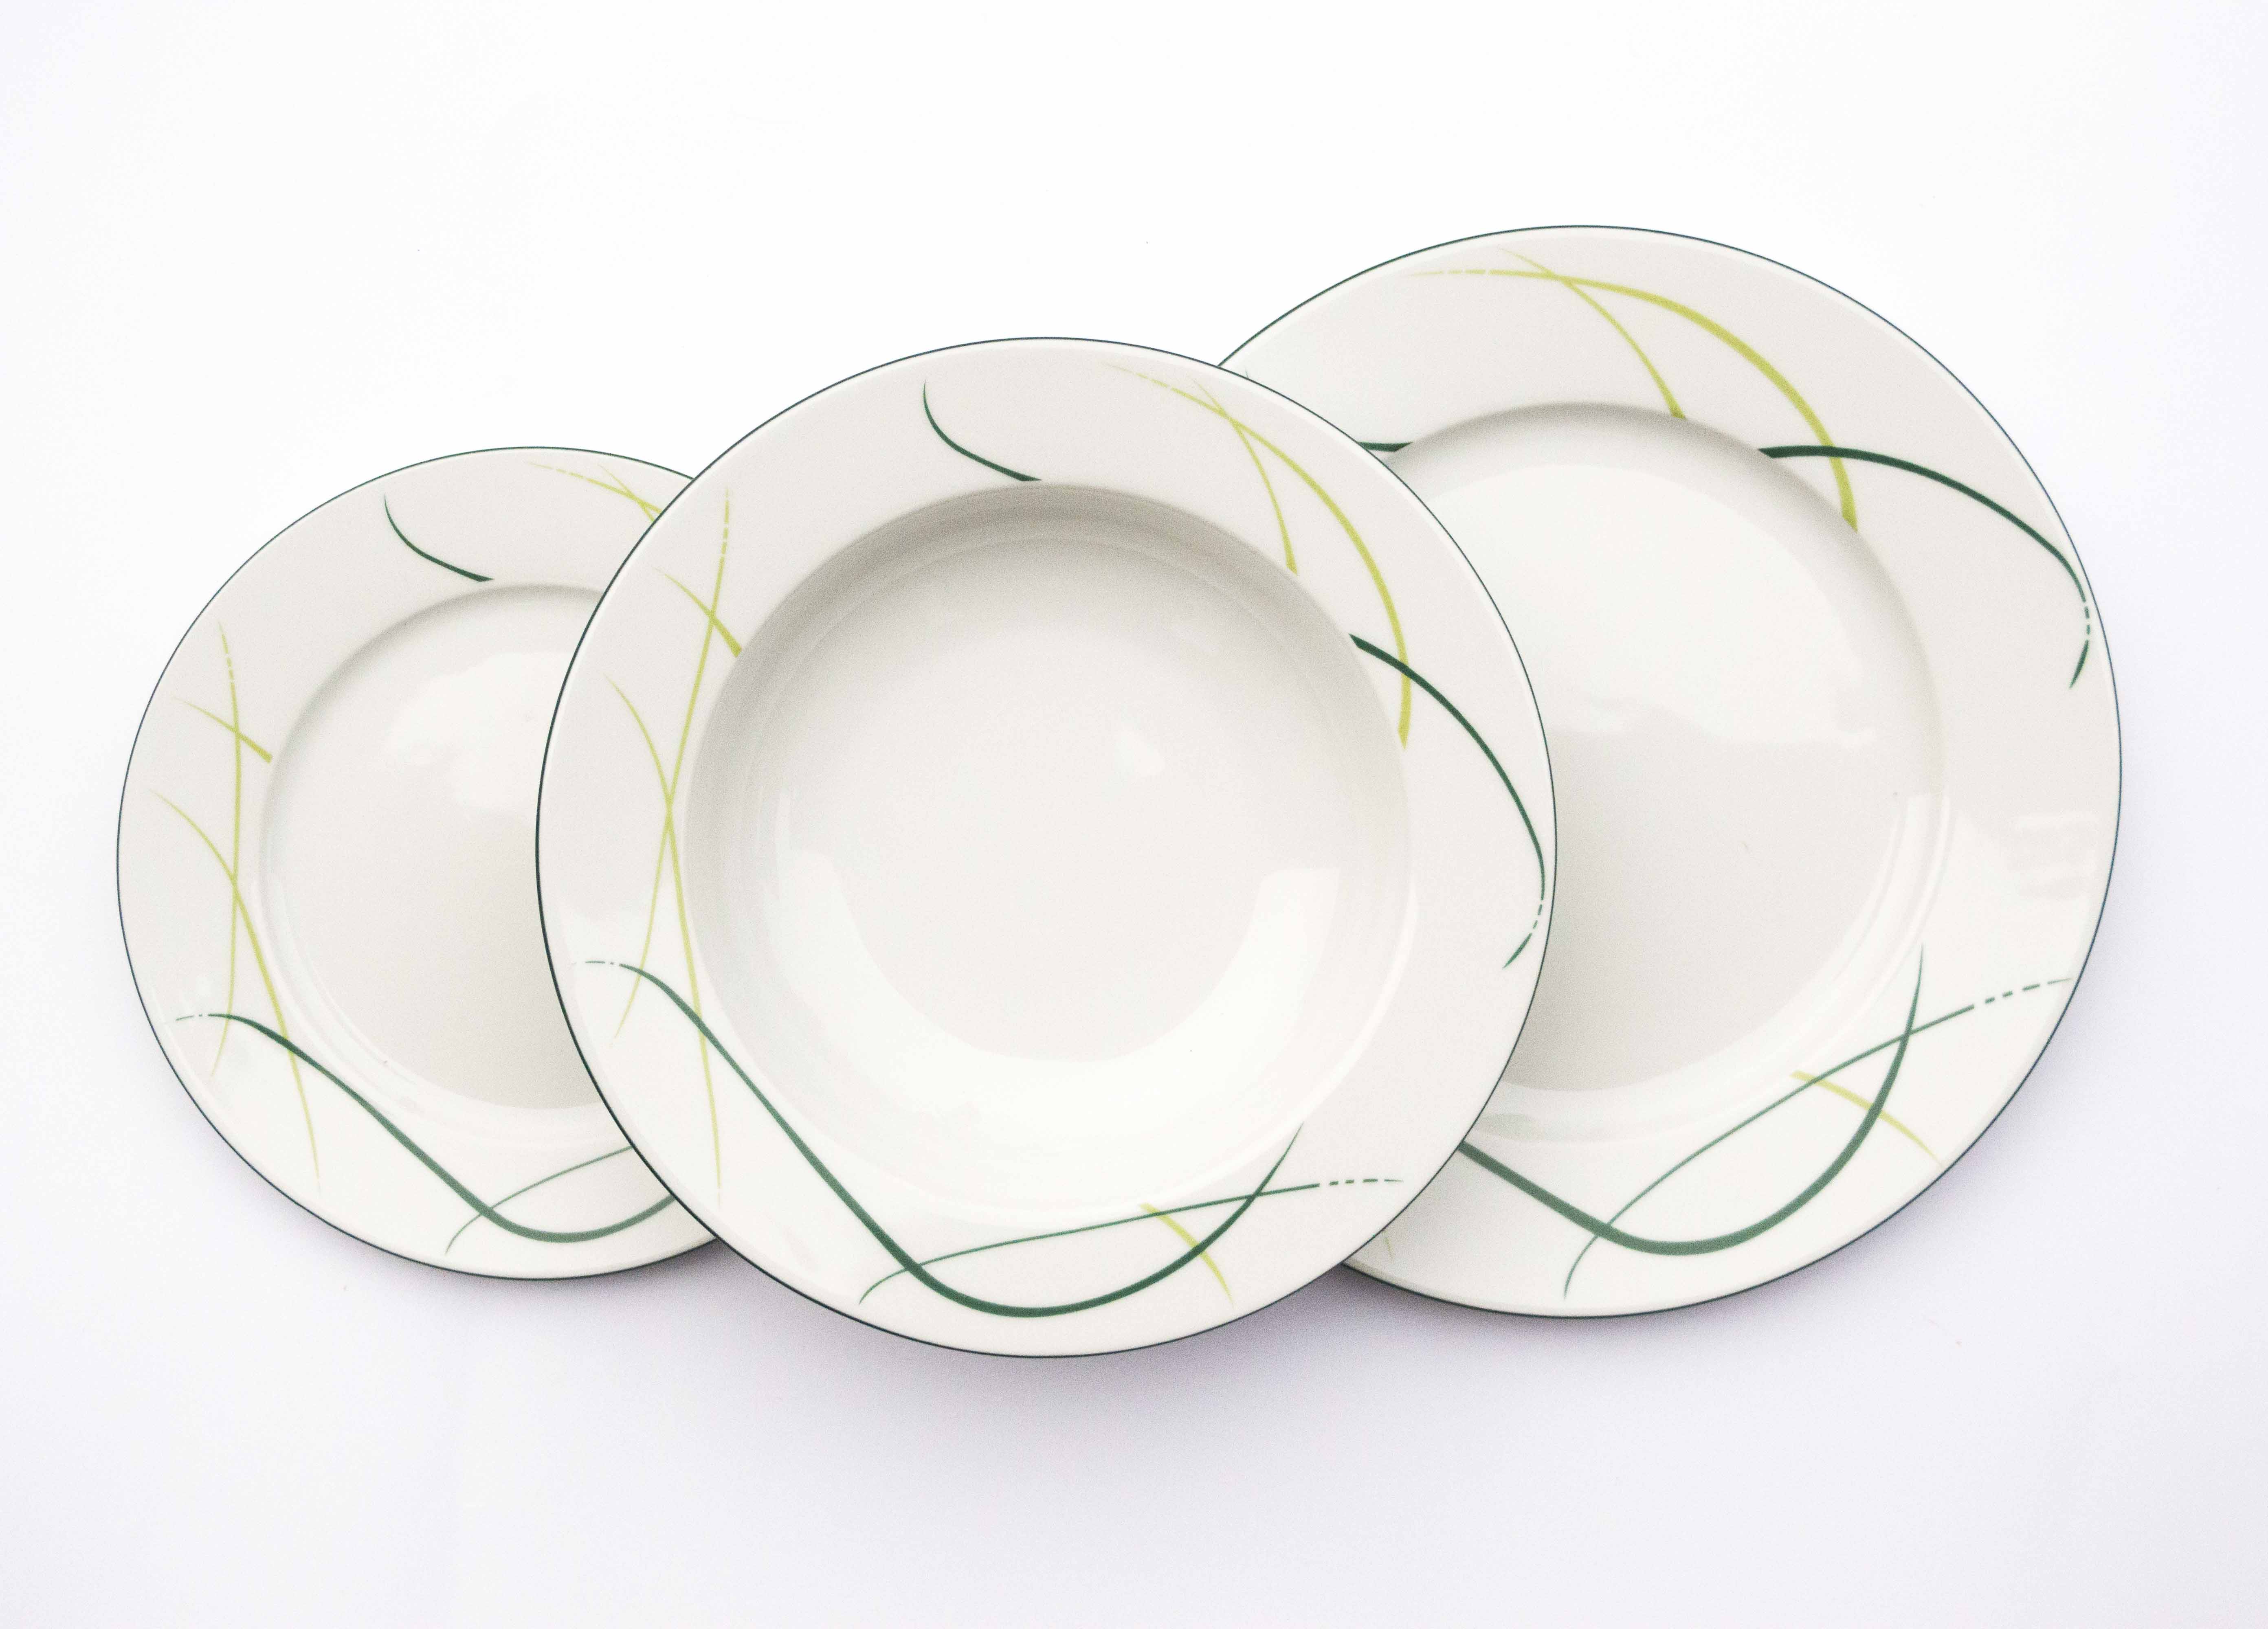 Karlovarský porcelán, sada talířů, Opal, Thun, 18 dílná